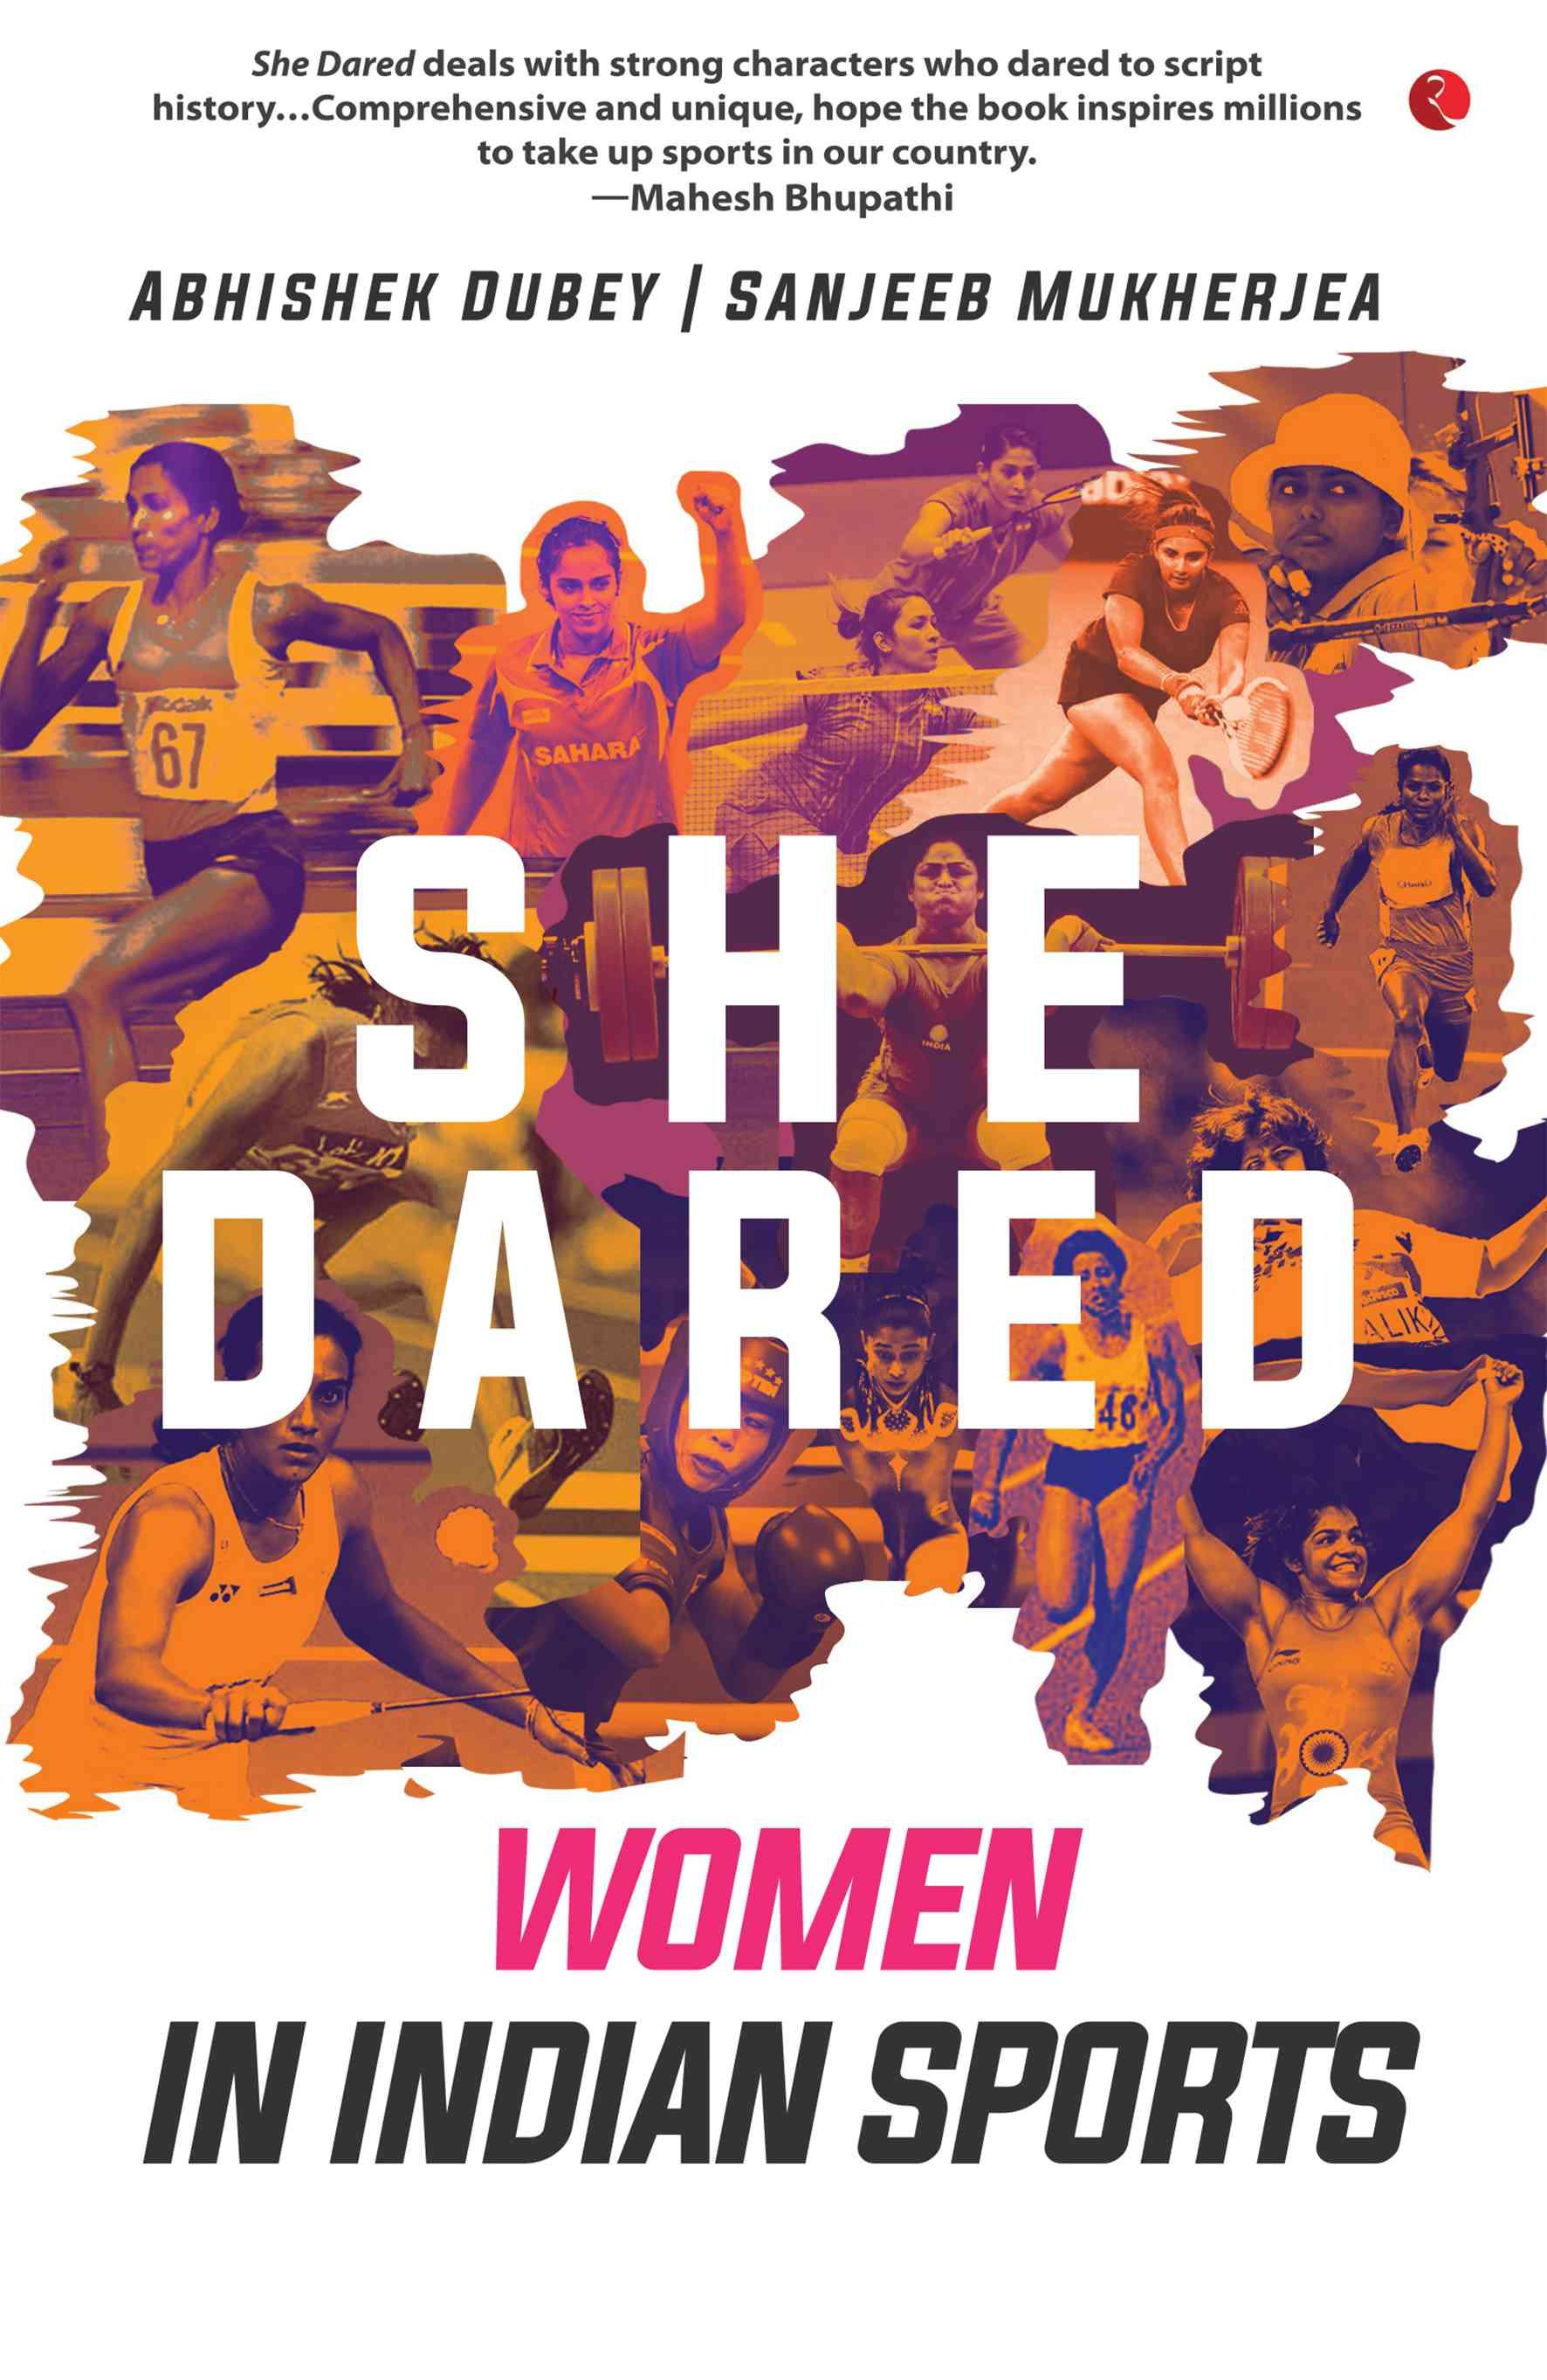 She Dared: Women In Indian Sports